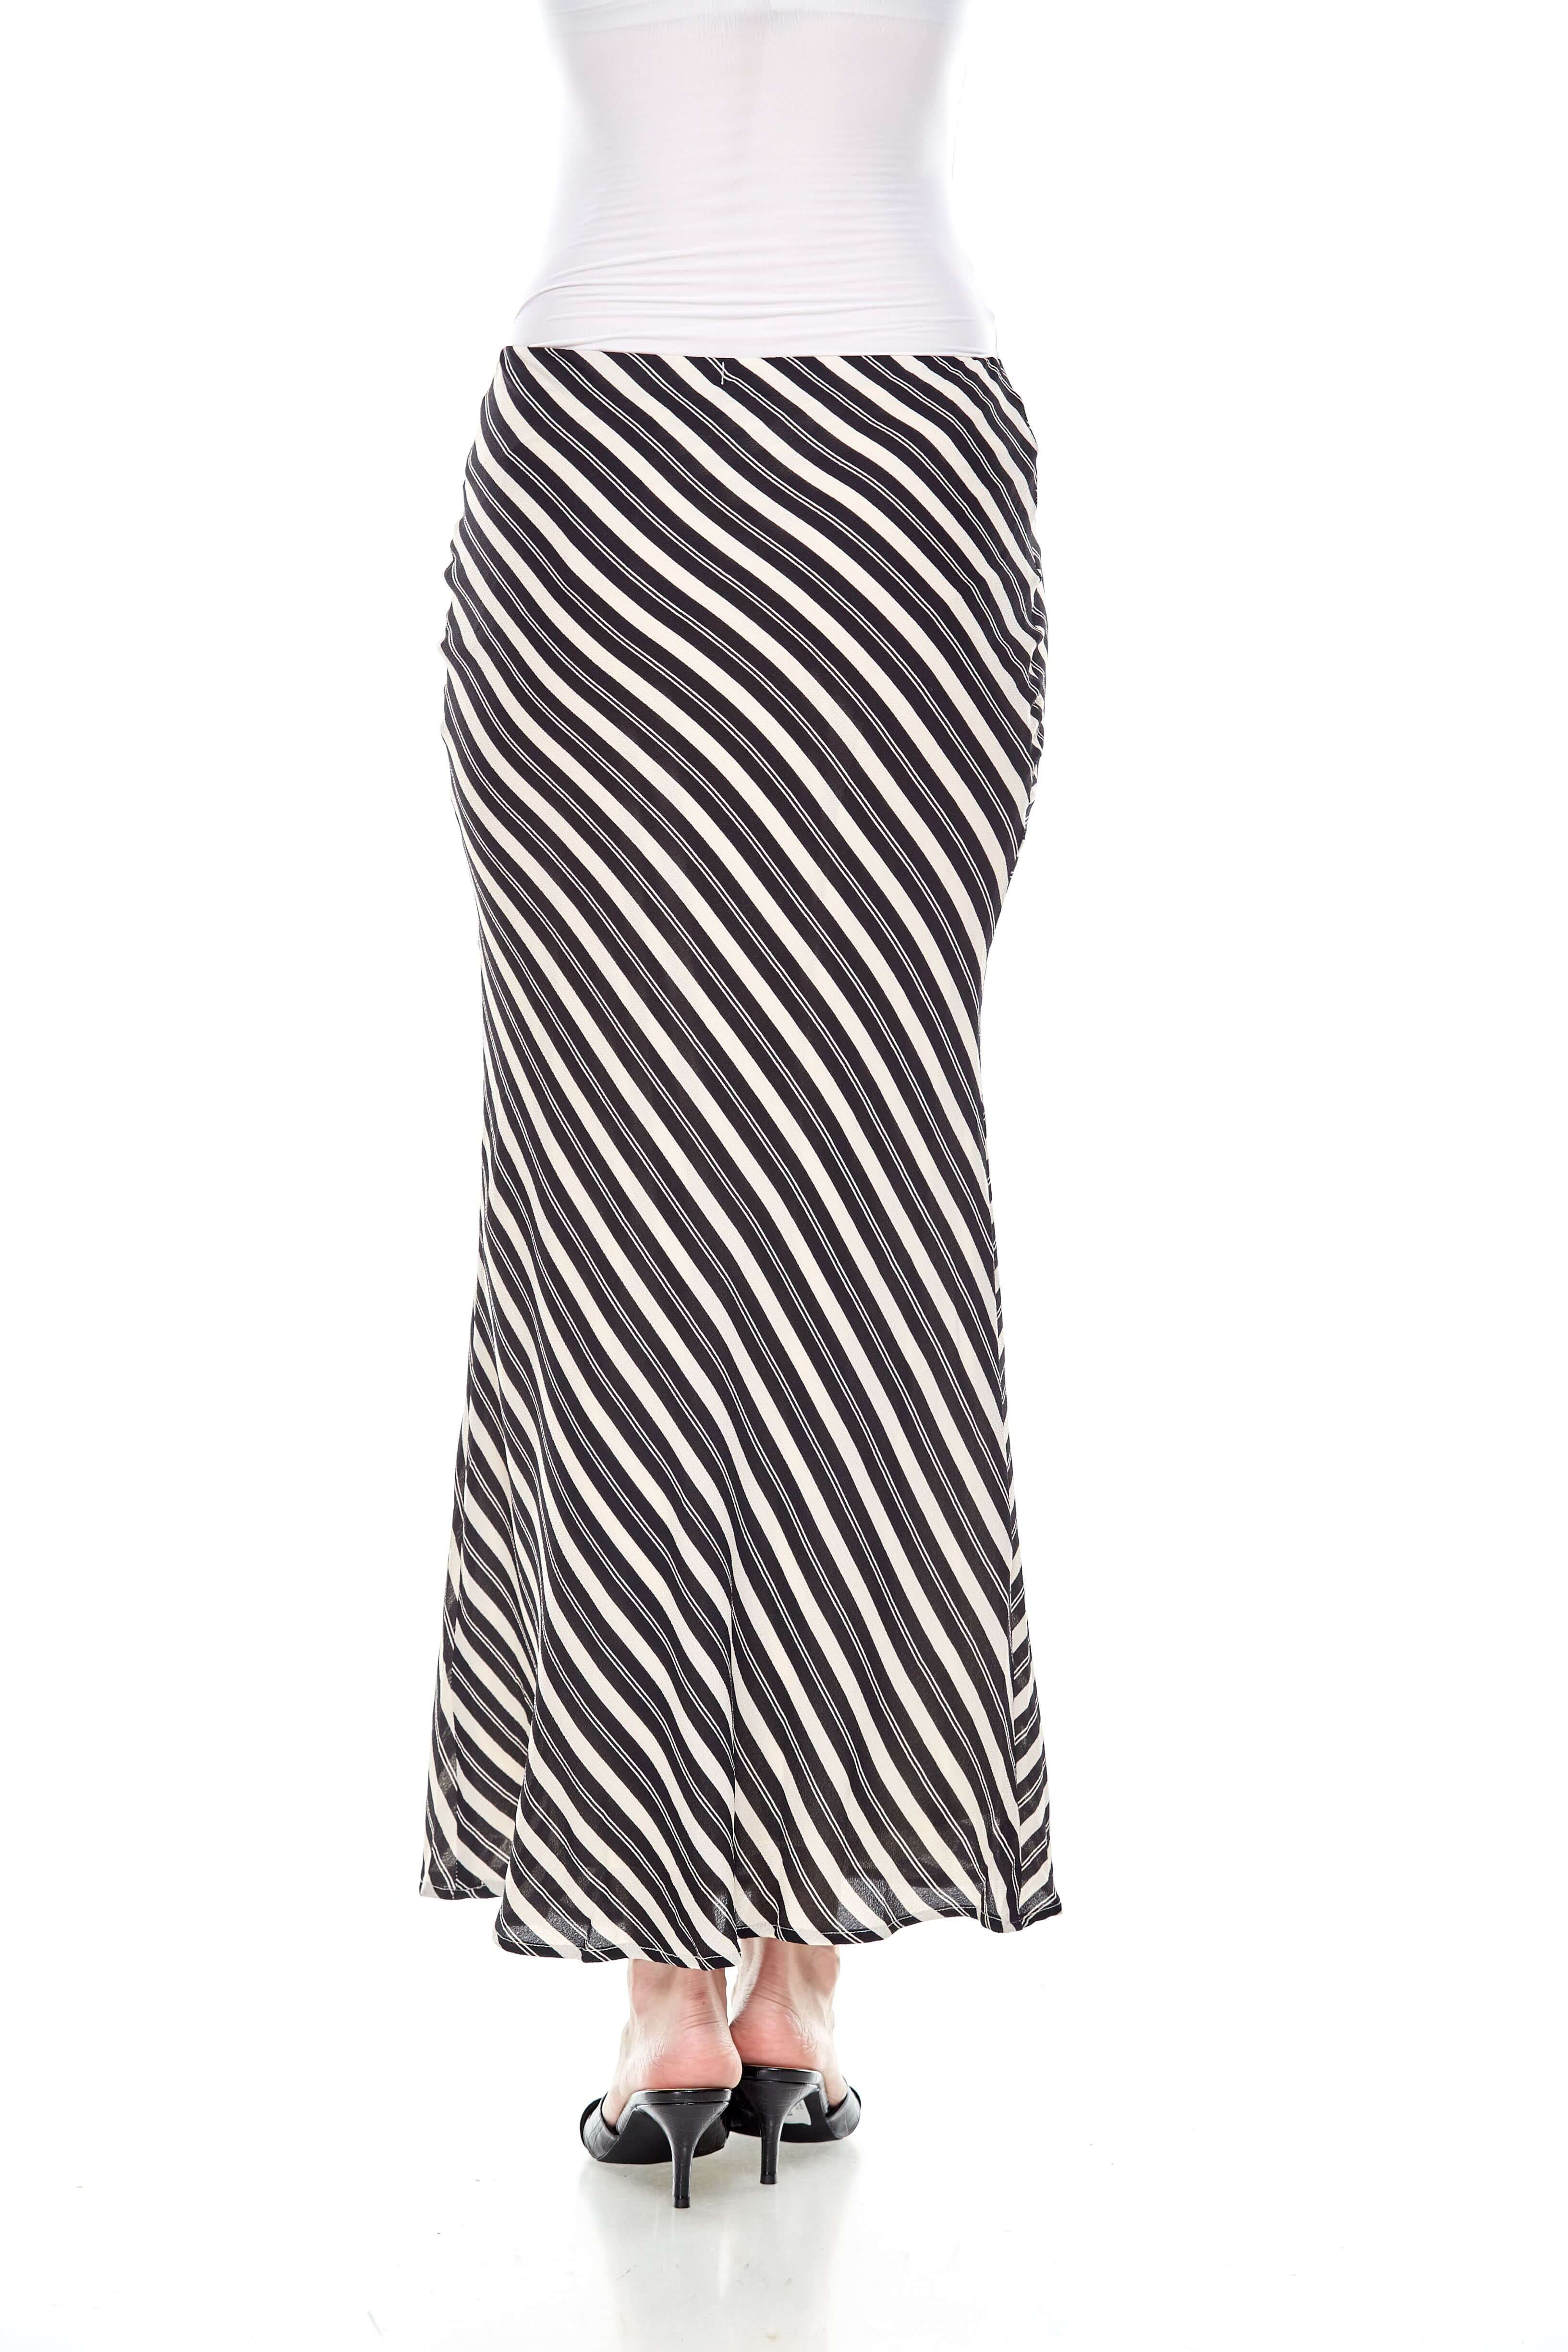 Black Striped Mermaid Skirt (6)